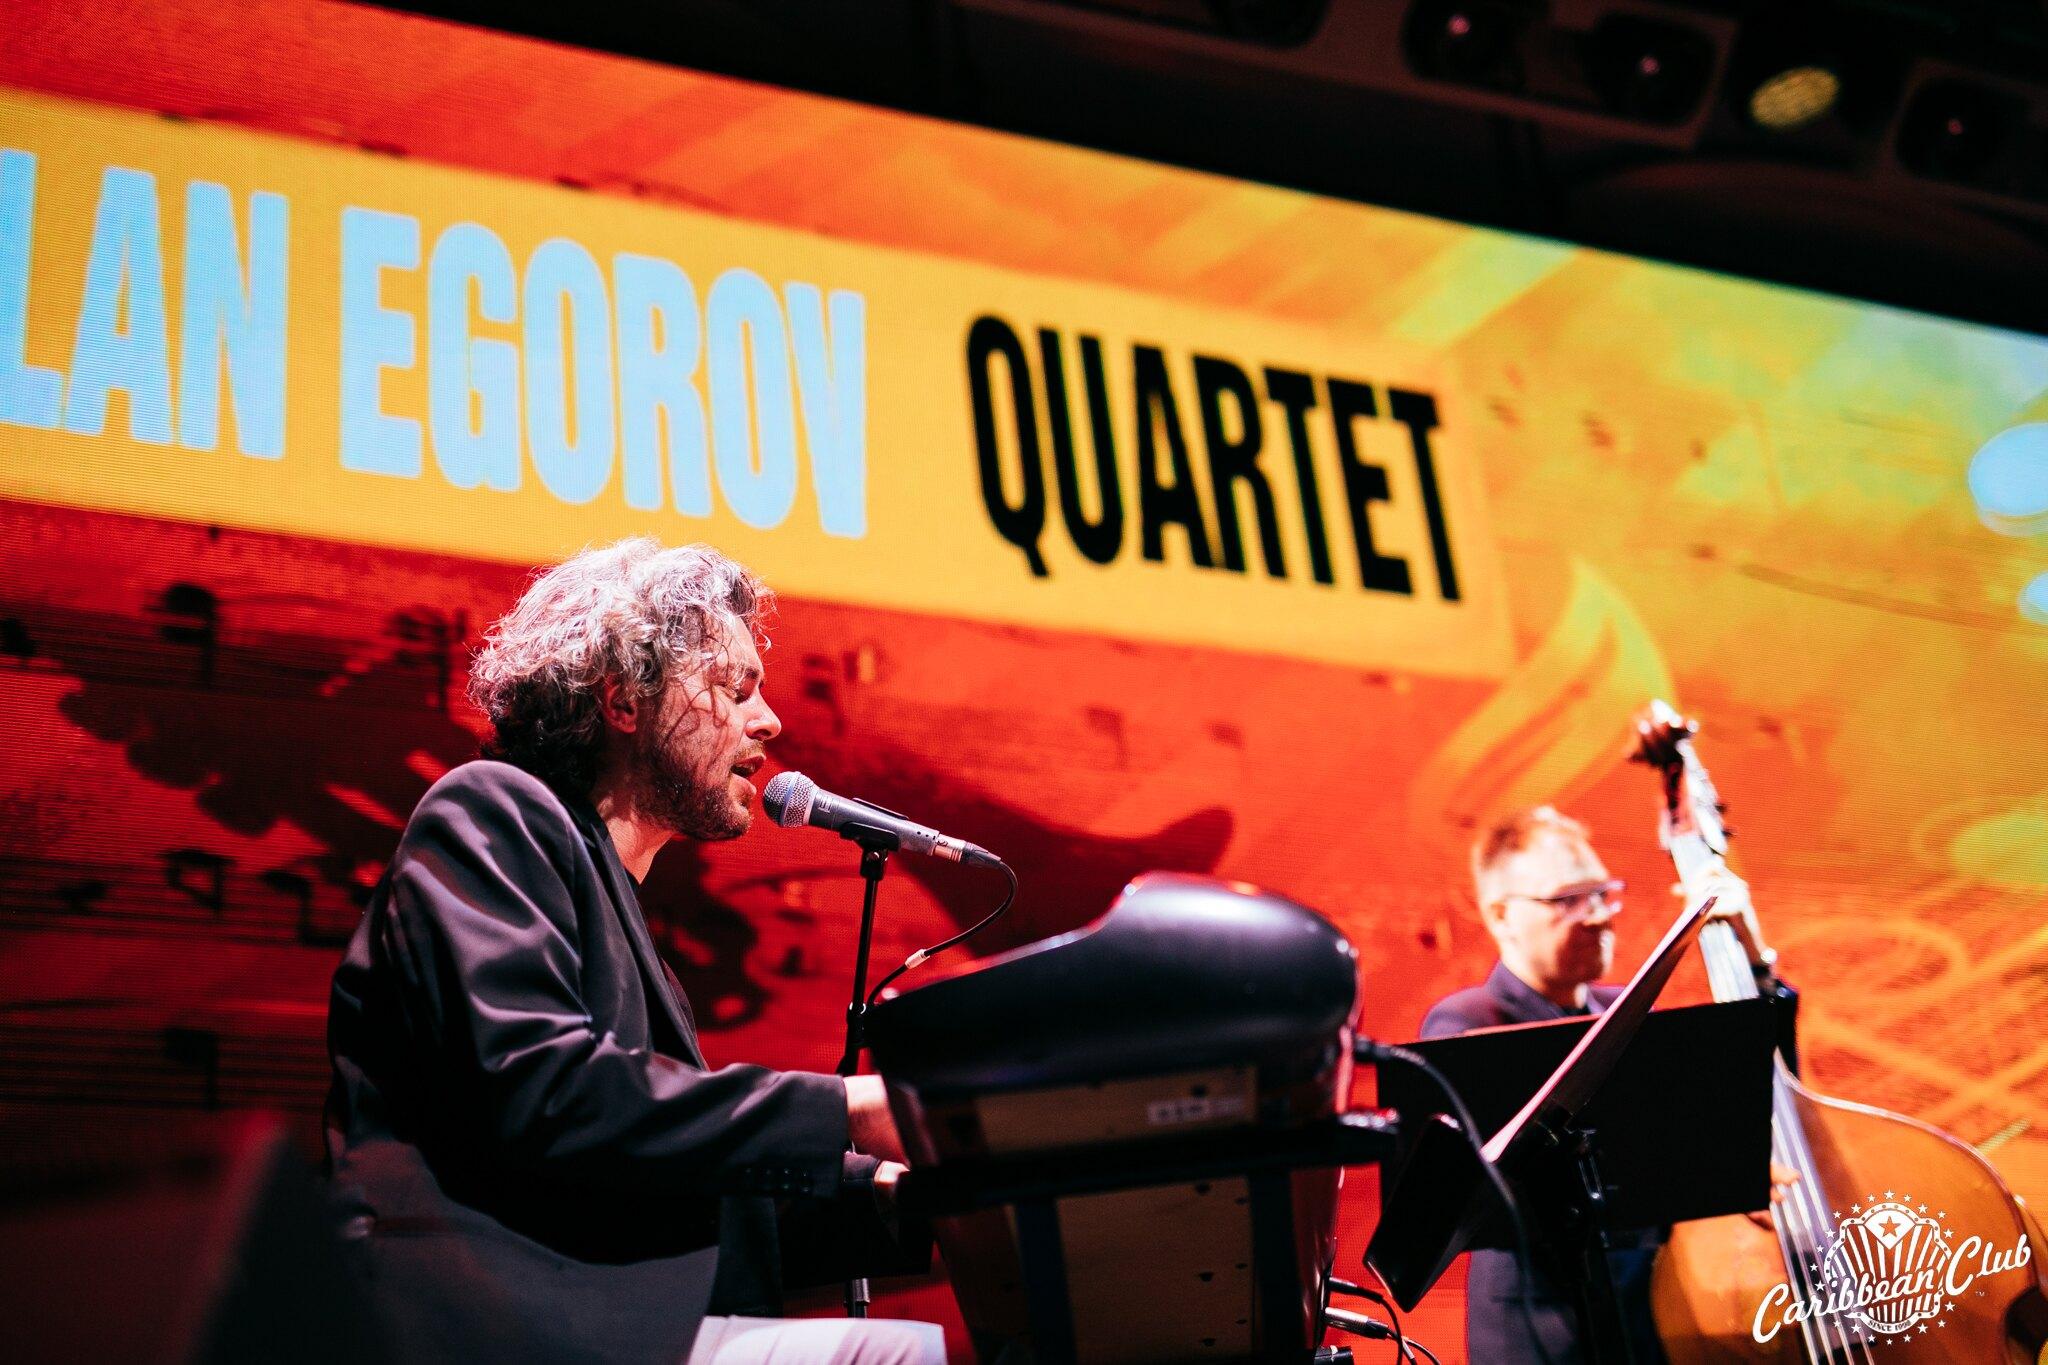 Ruslan Egorov Quartet